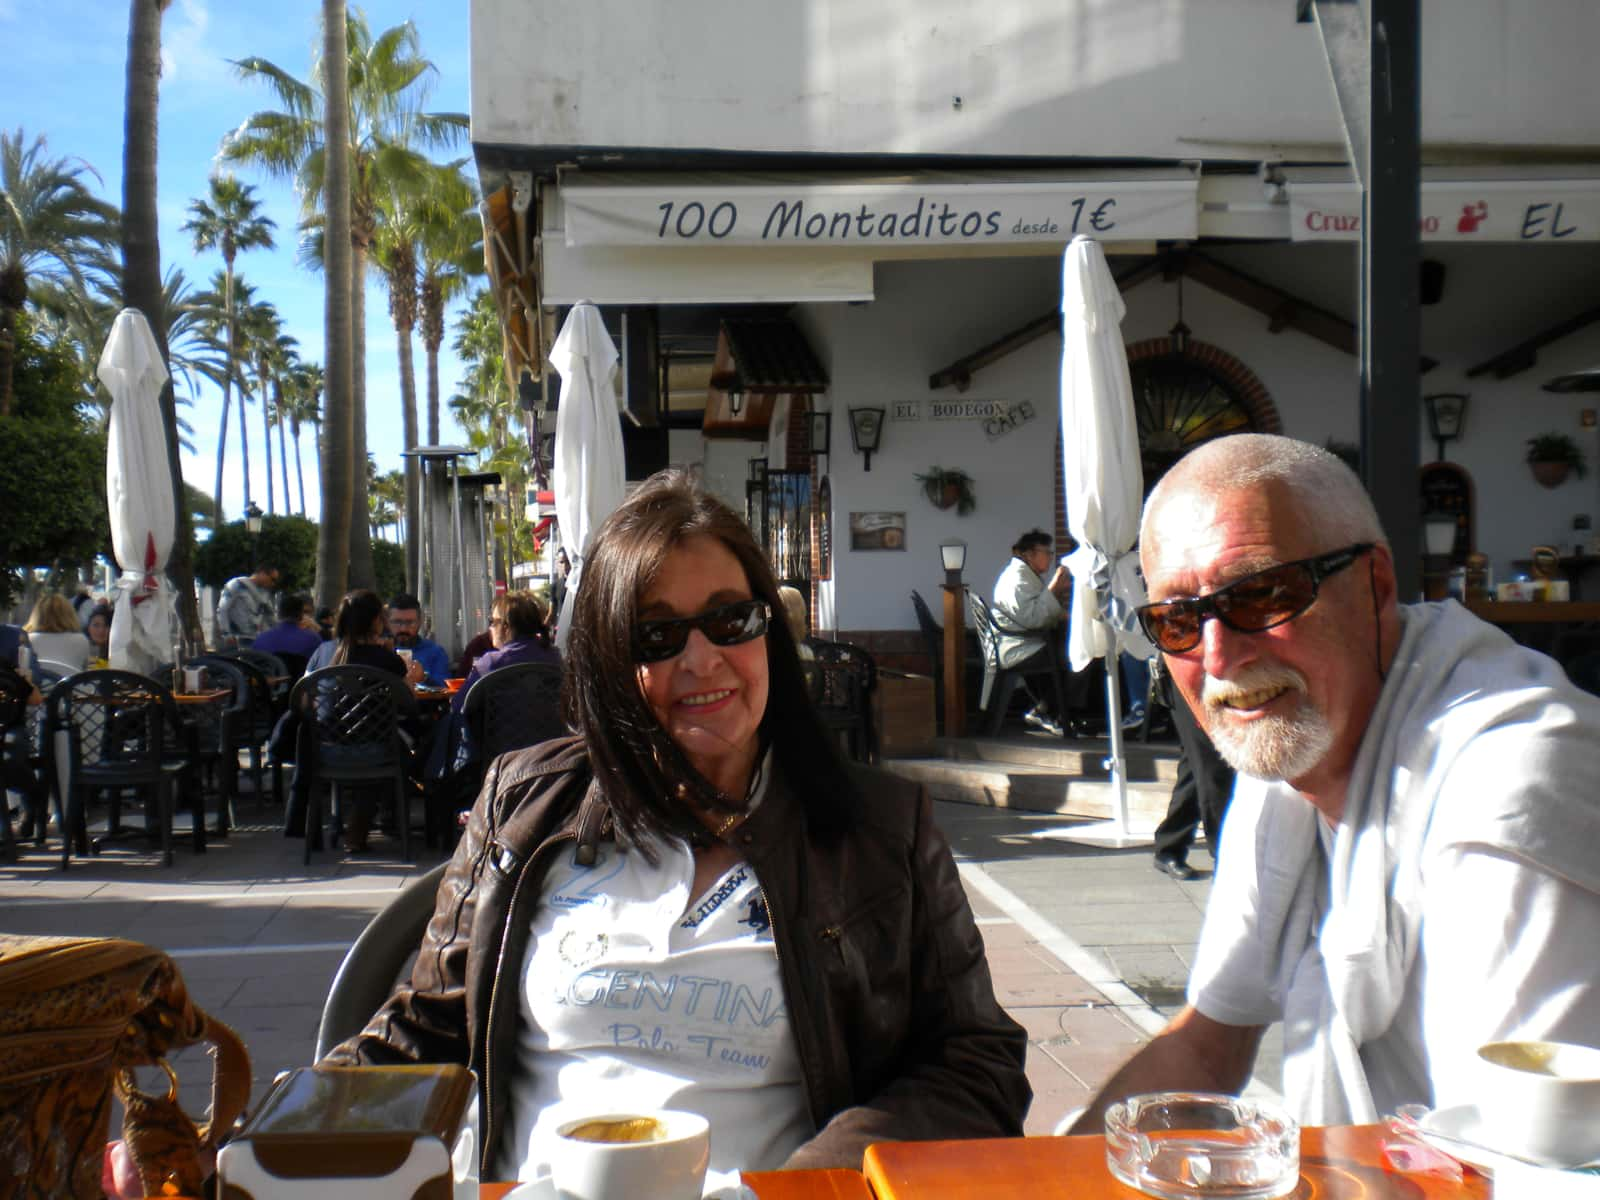 Gisela & Raimund from Aachen, Germany